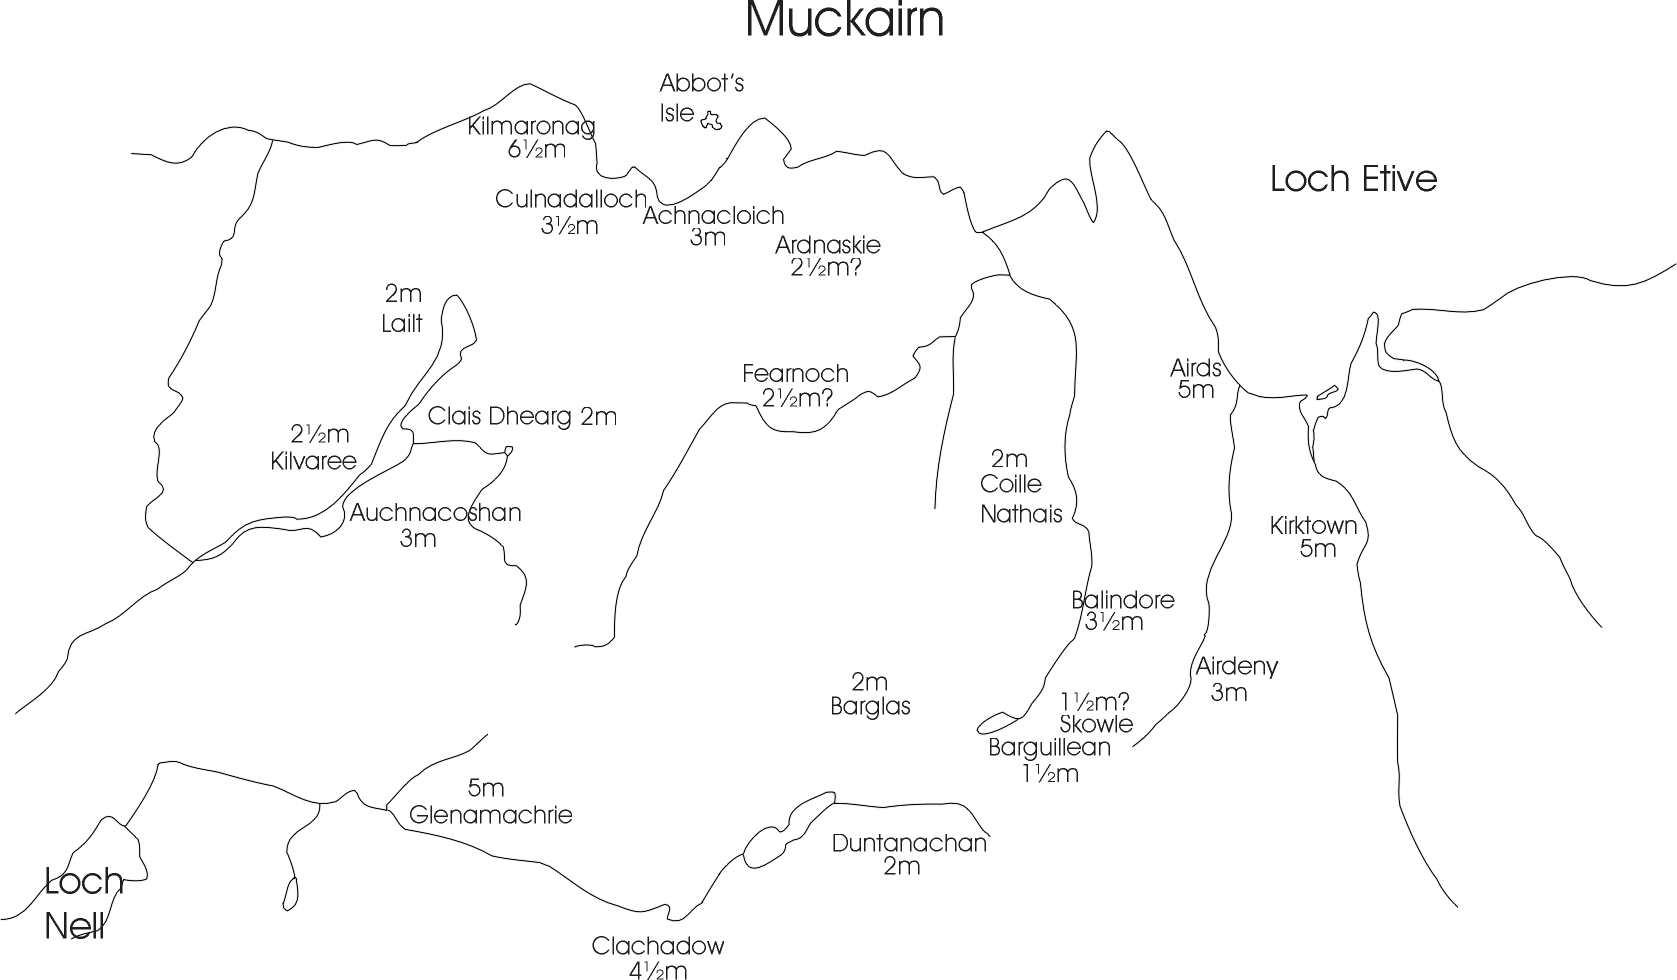 muckairn2